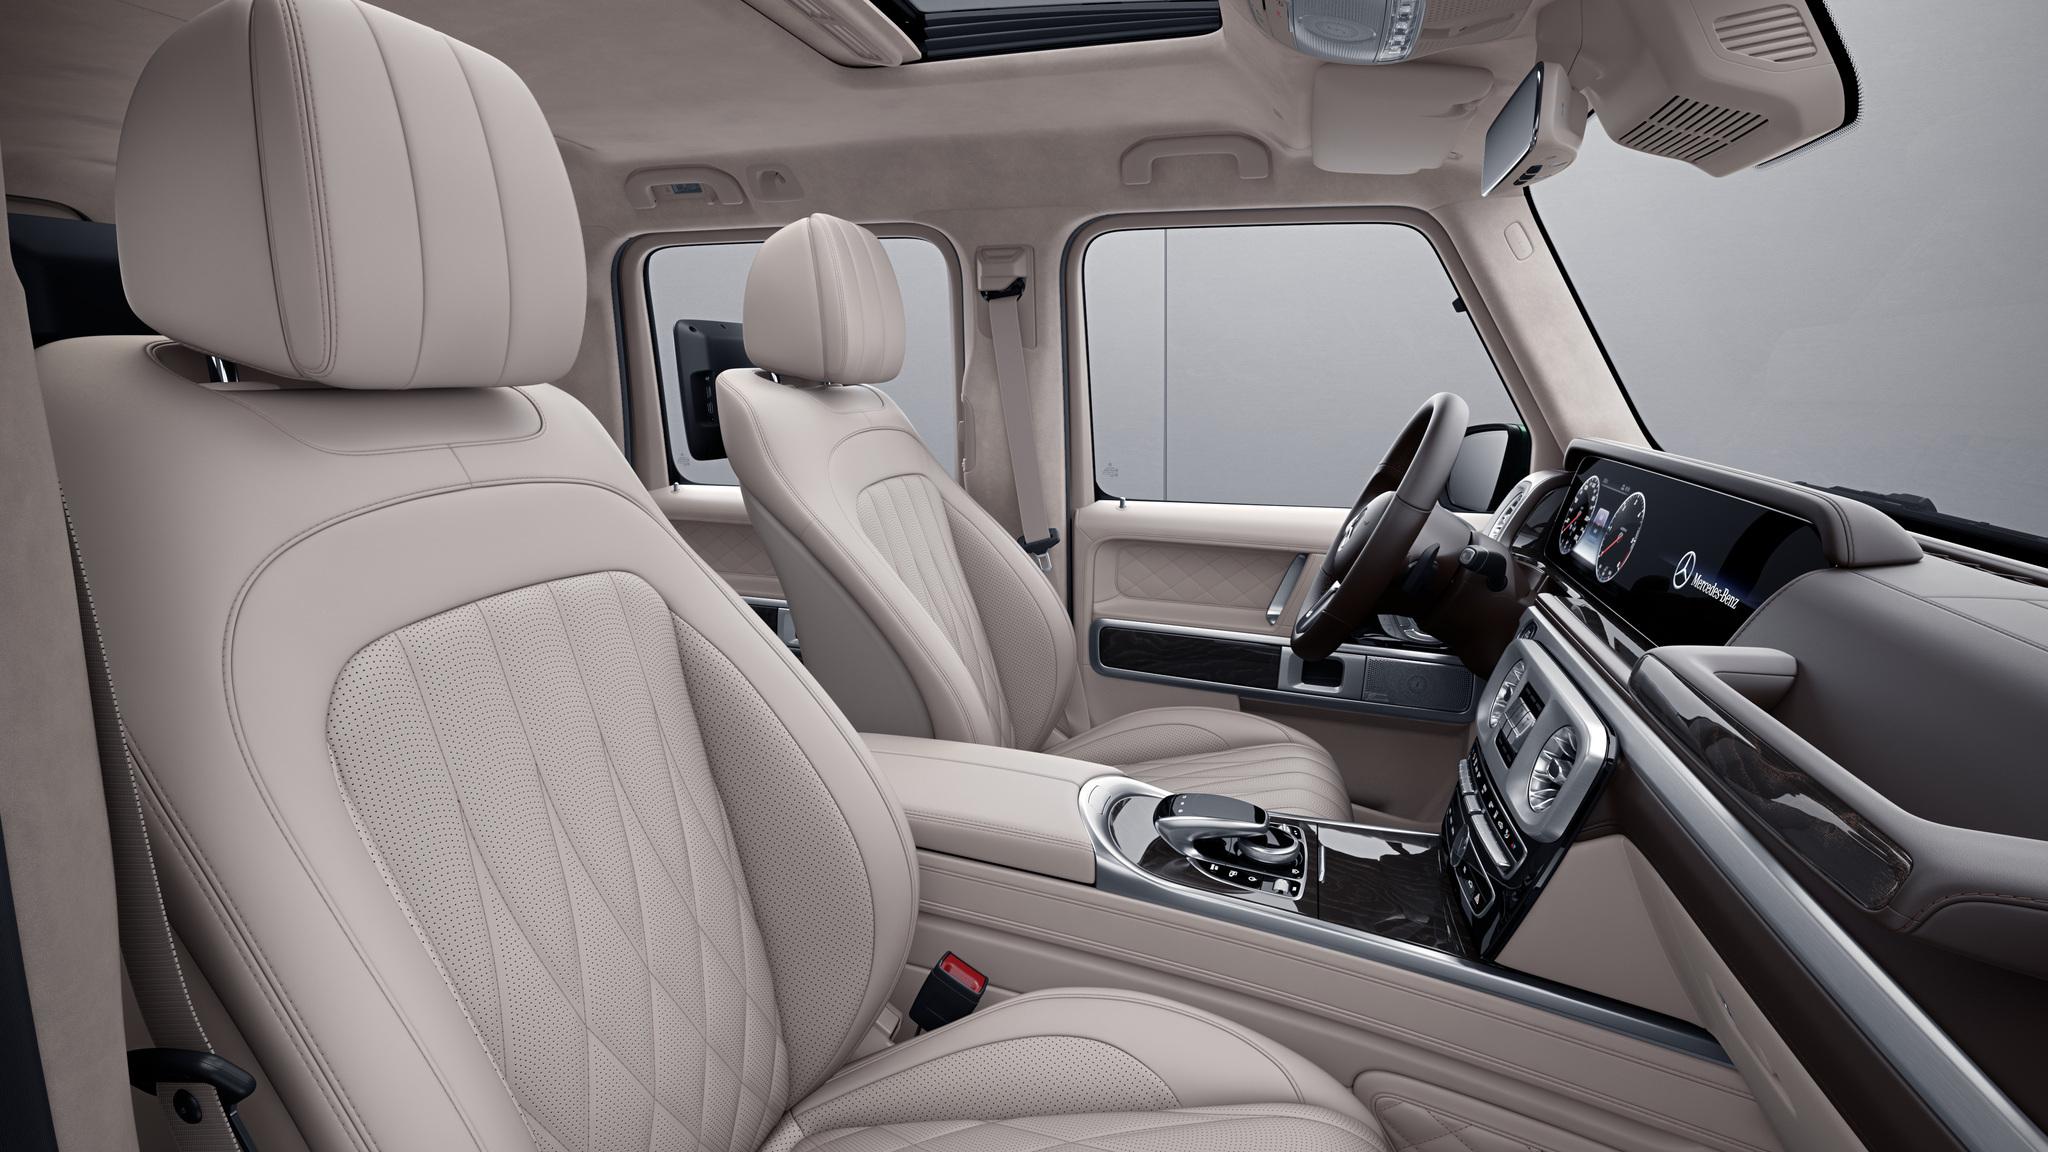 Habitacle de la Mercedes Classe G avec une Sellerie cuir nappa bicolore - Beige macchiato marron expresso